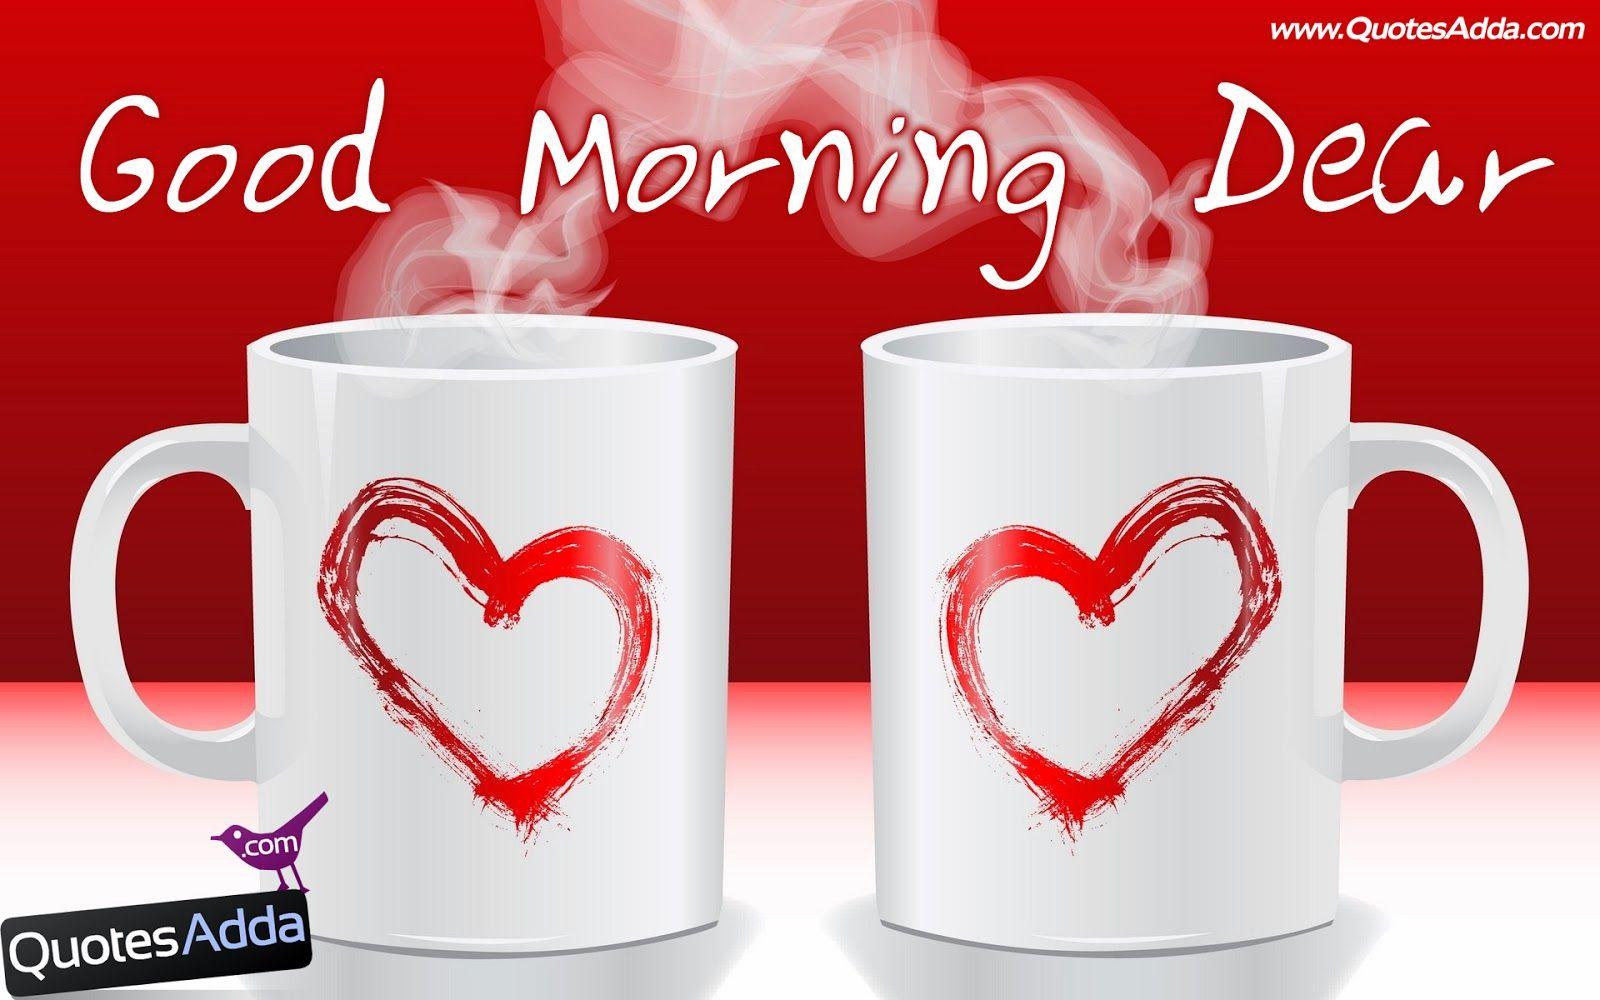 Good Morning Greetings In English For Lovers Quotesadda